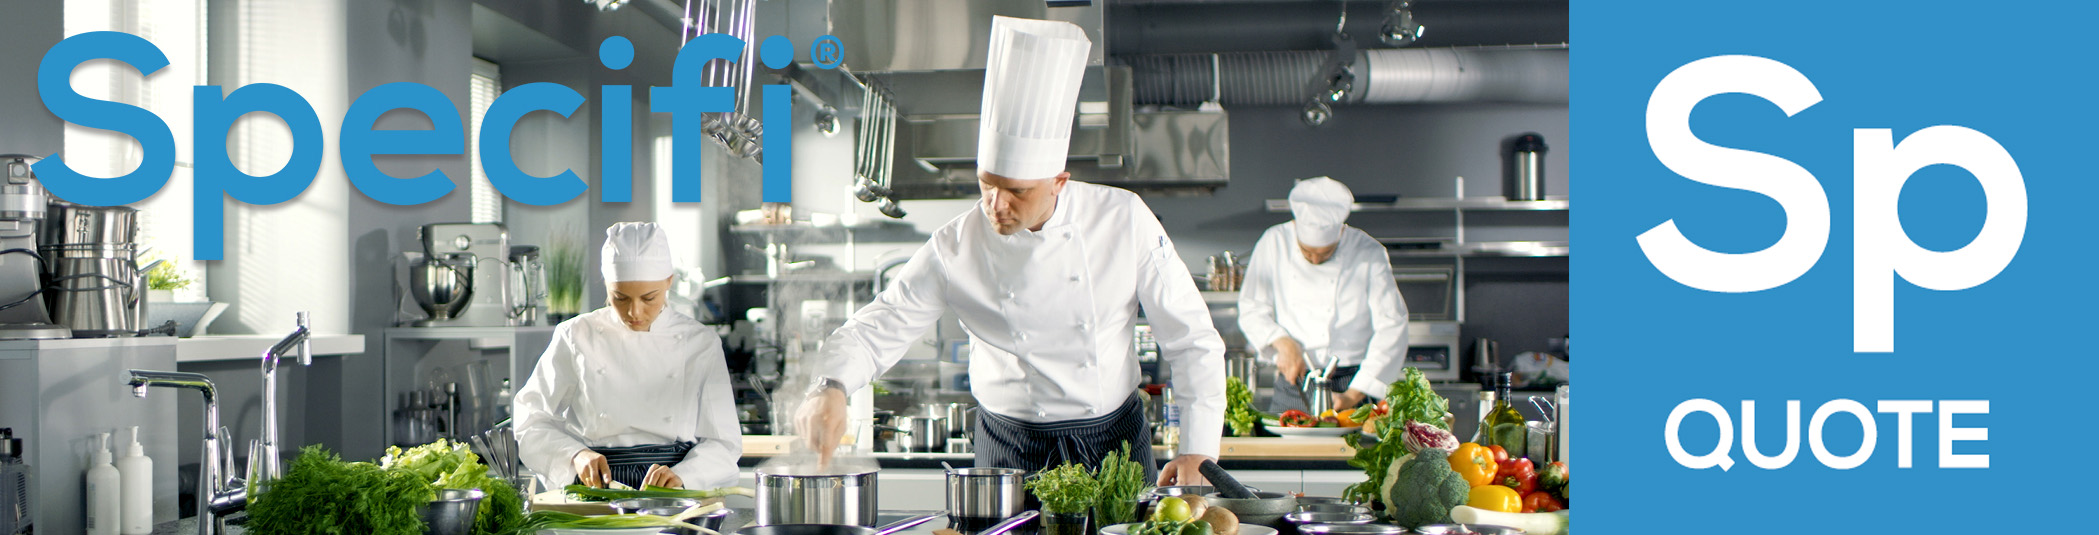 Specifi Chefs Header - Quote